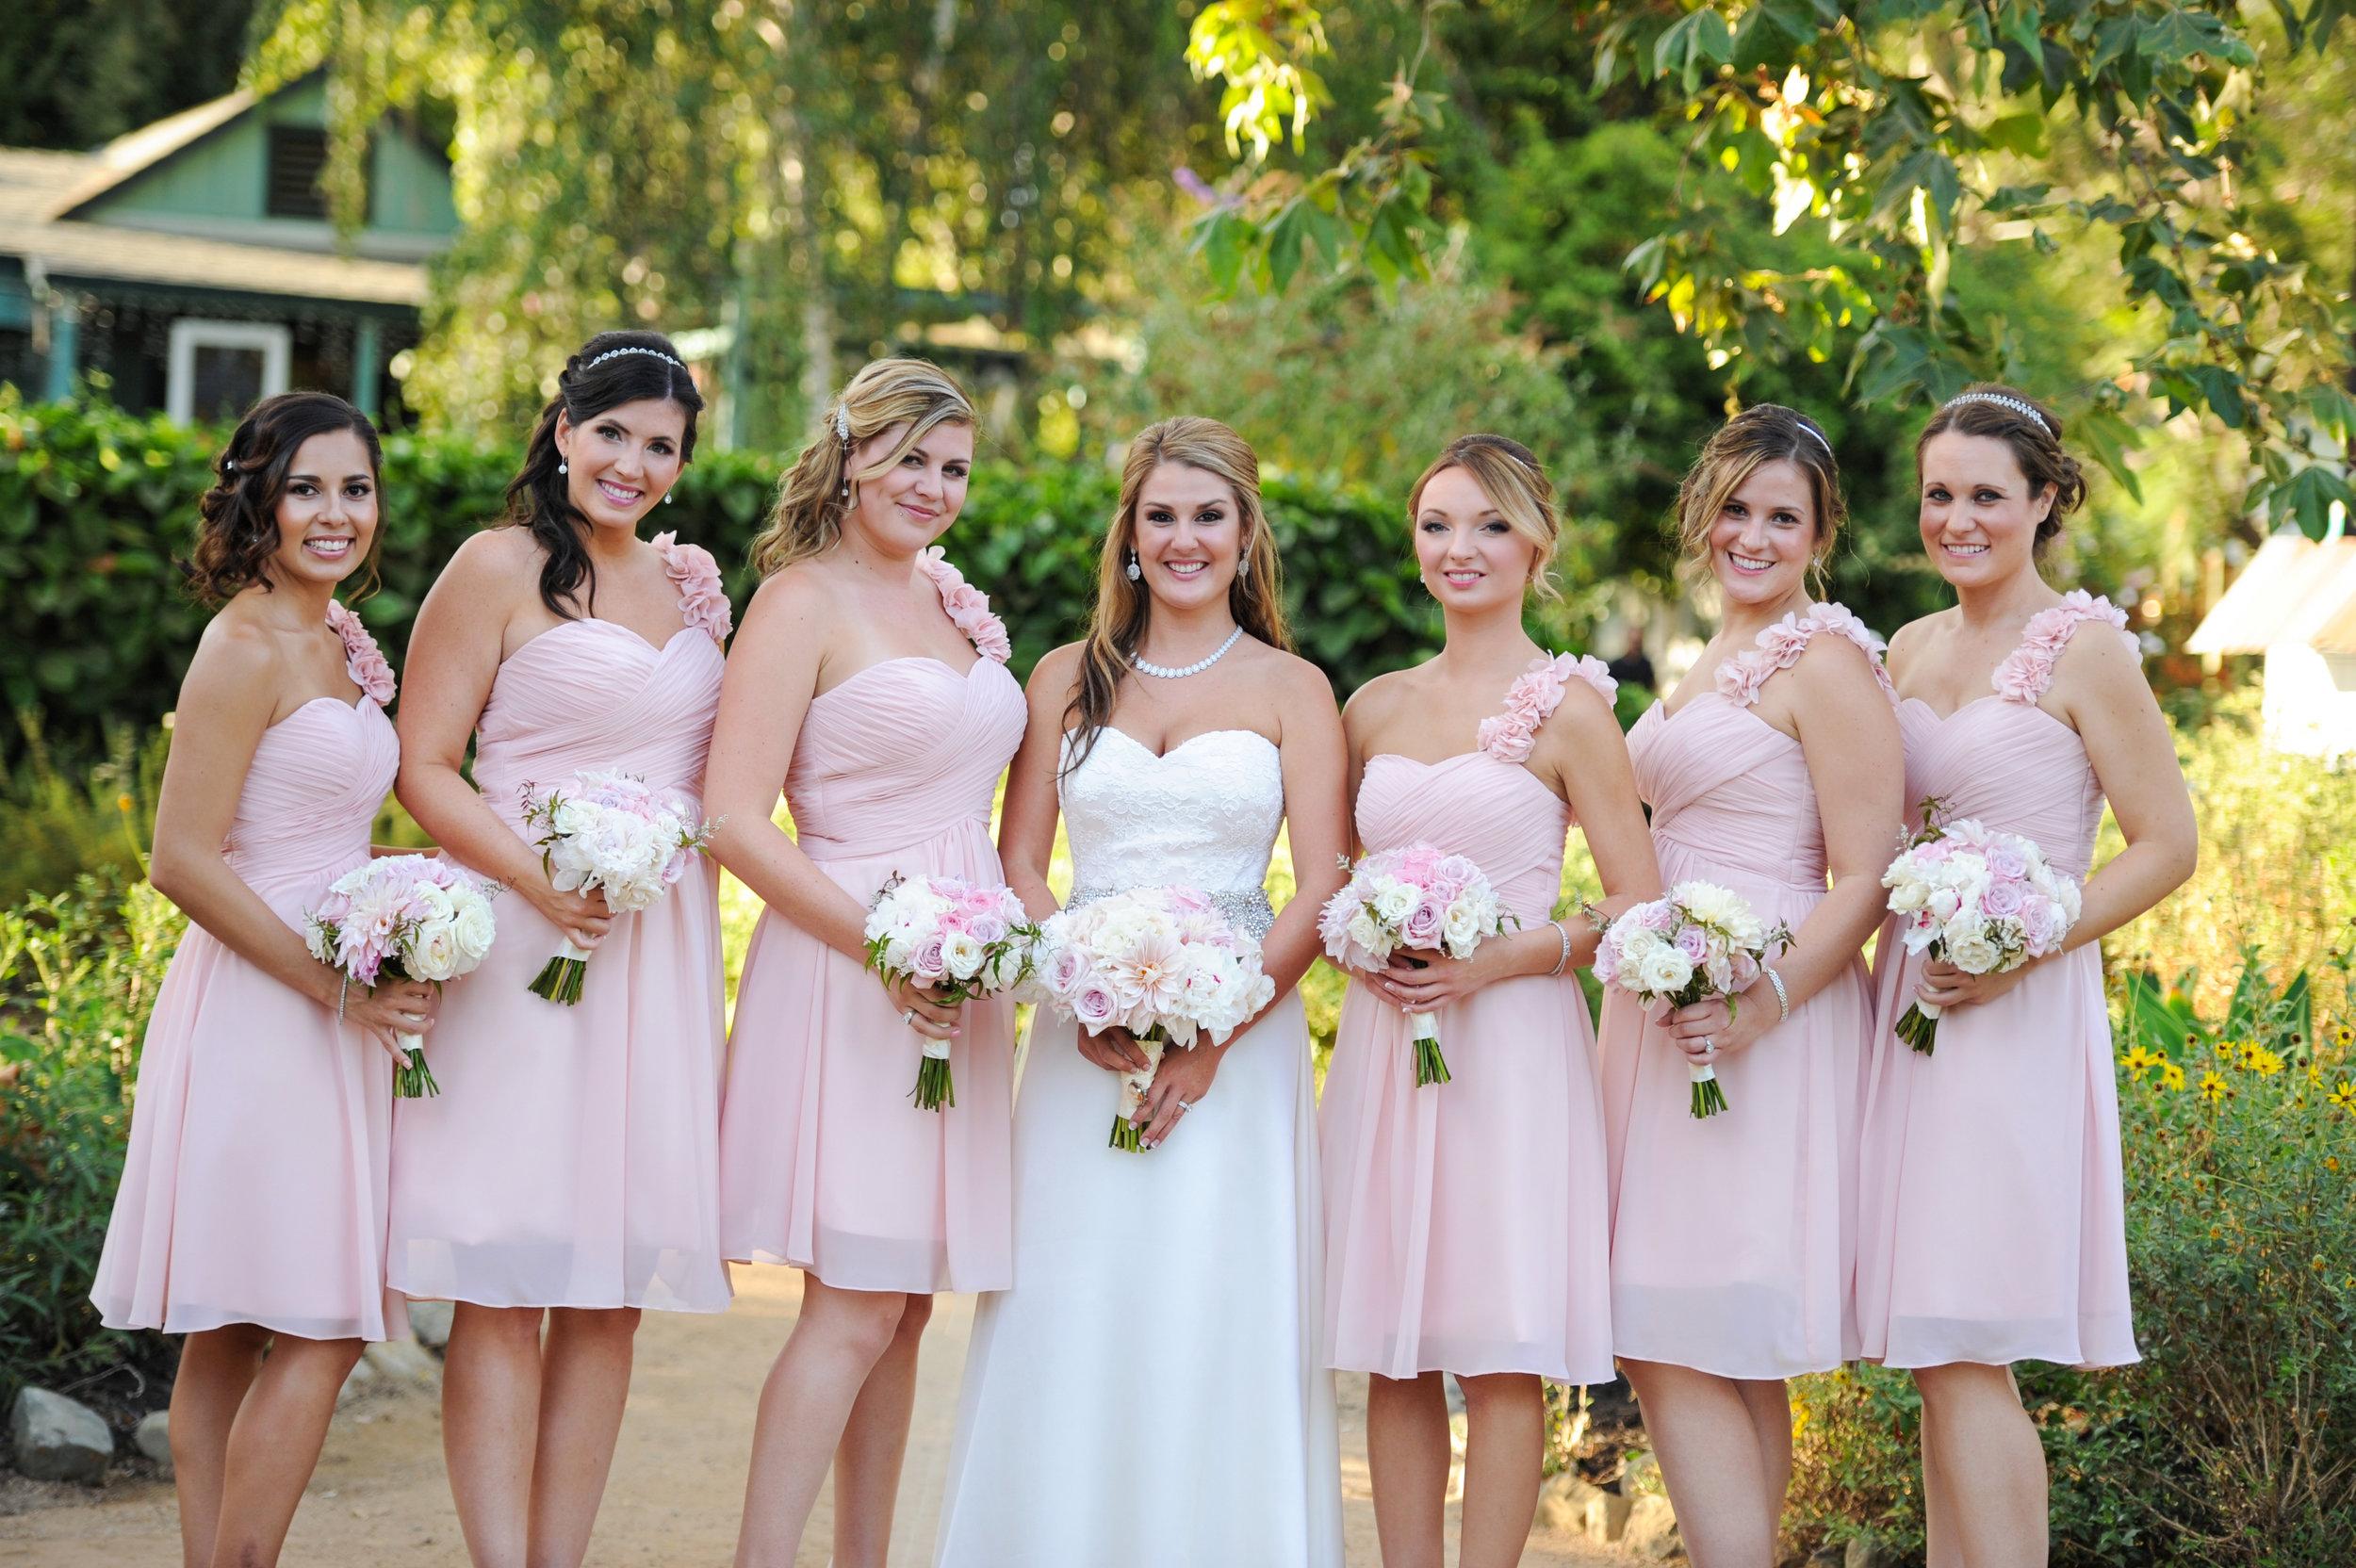 franciscan-gardens-wedding-4.jpg